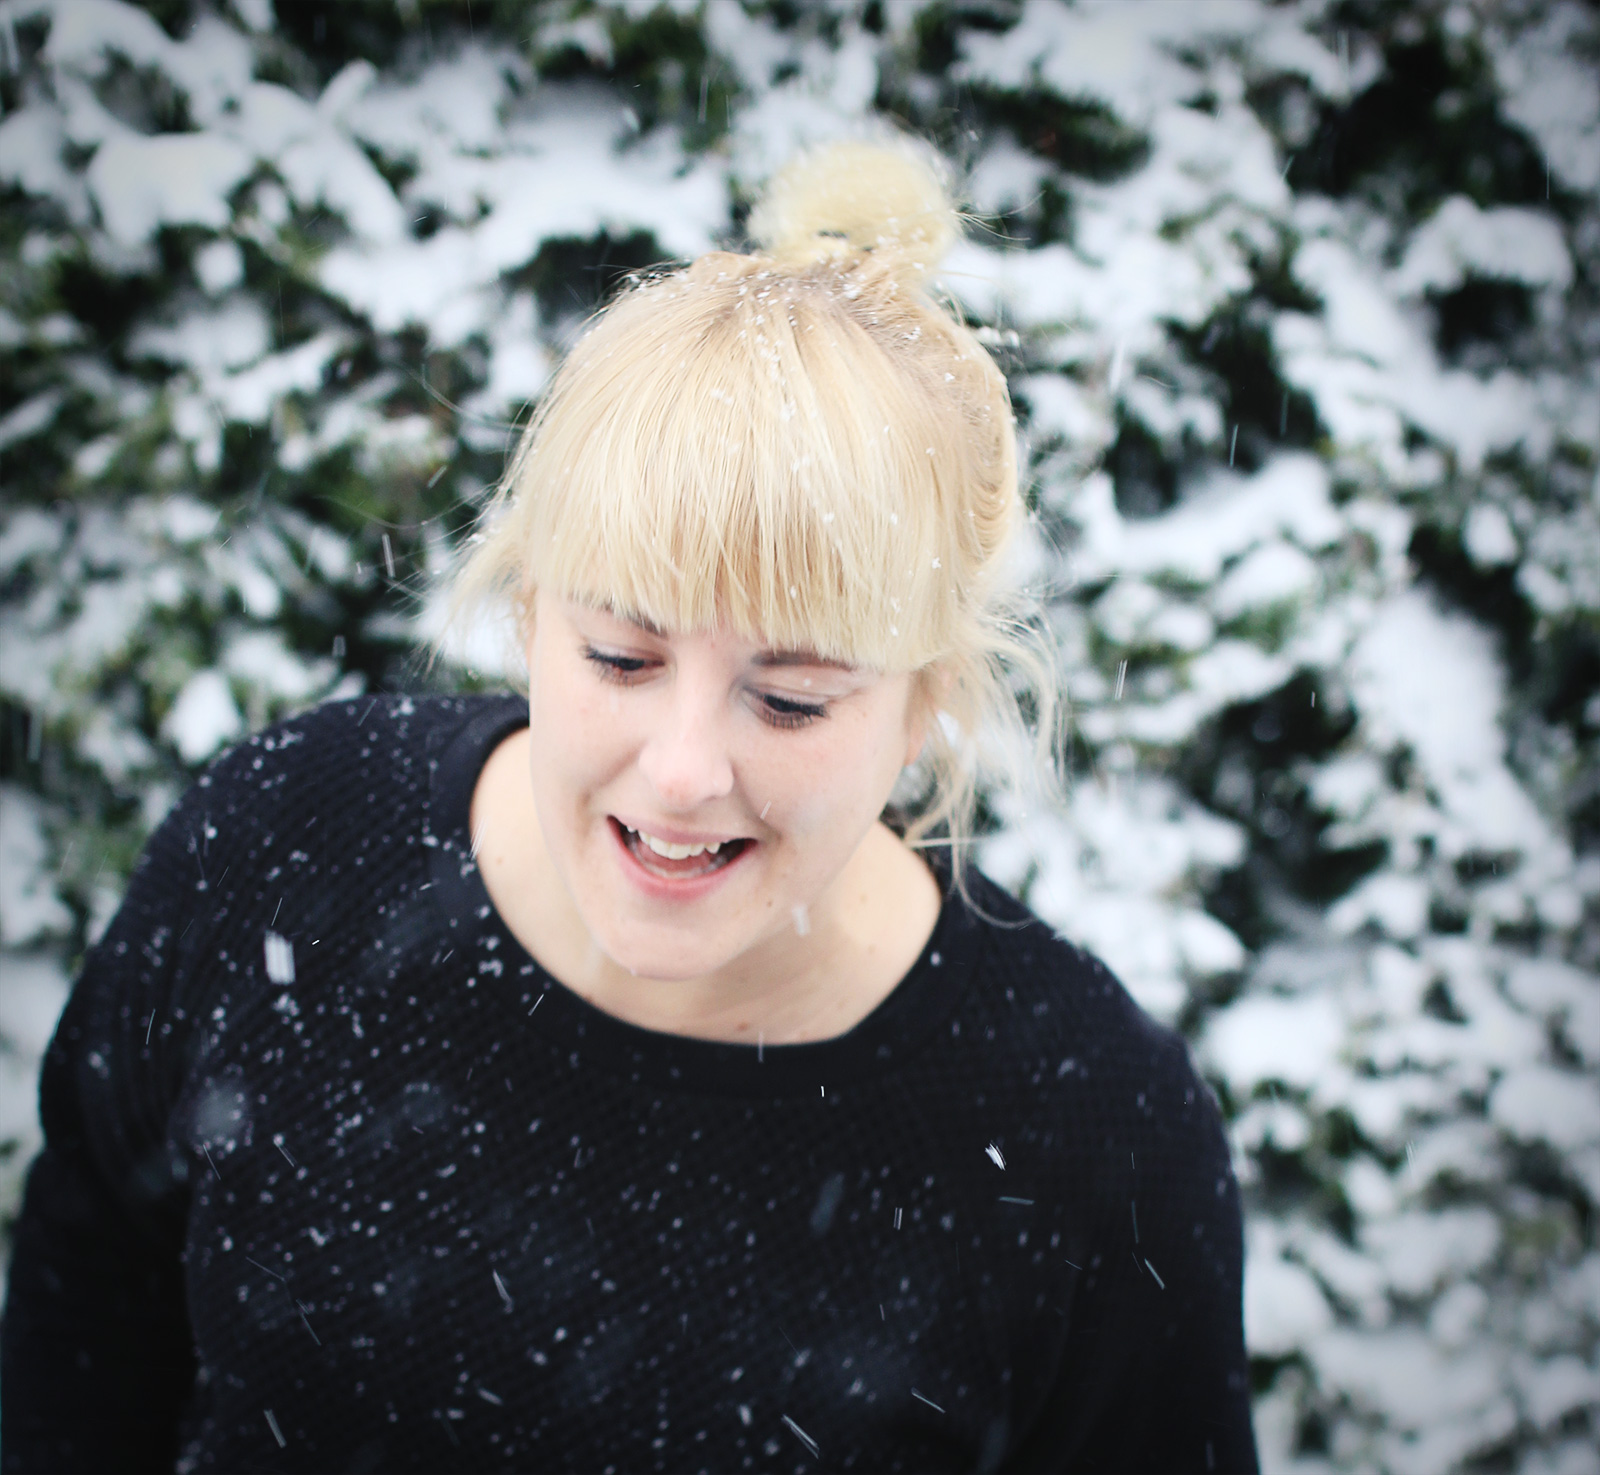 snow-03